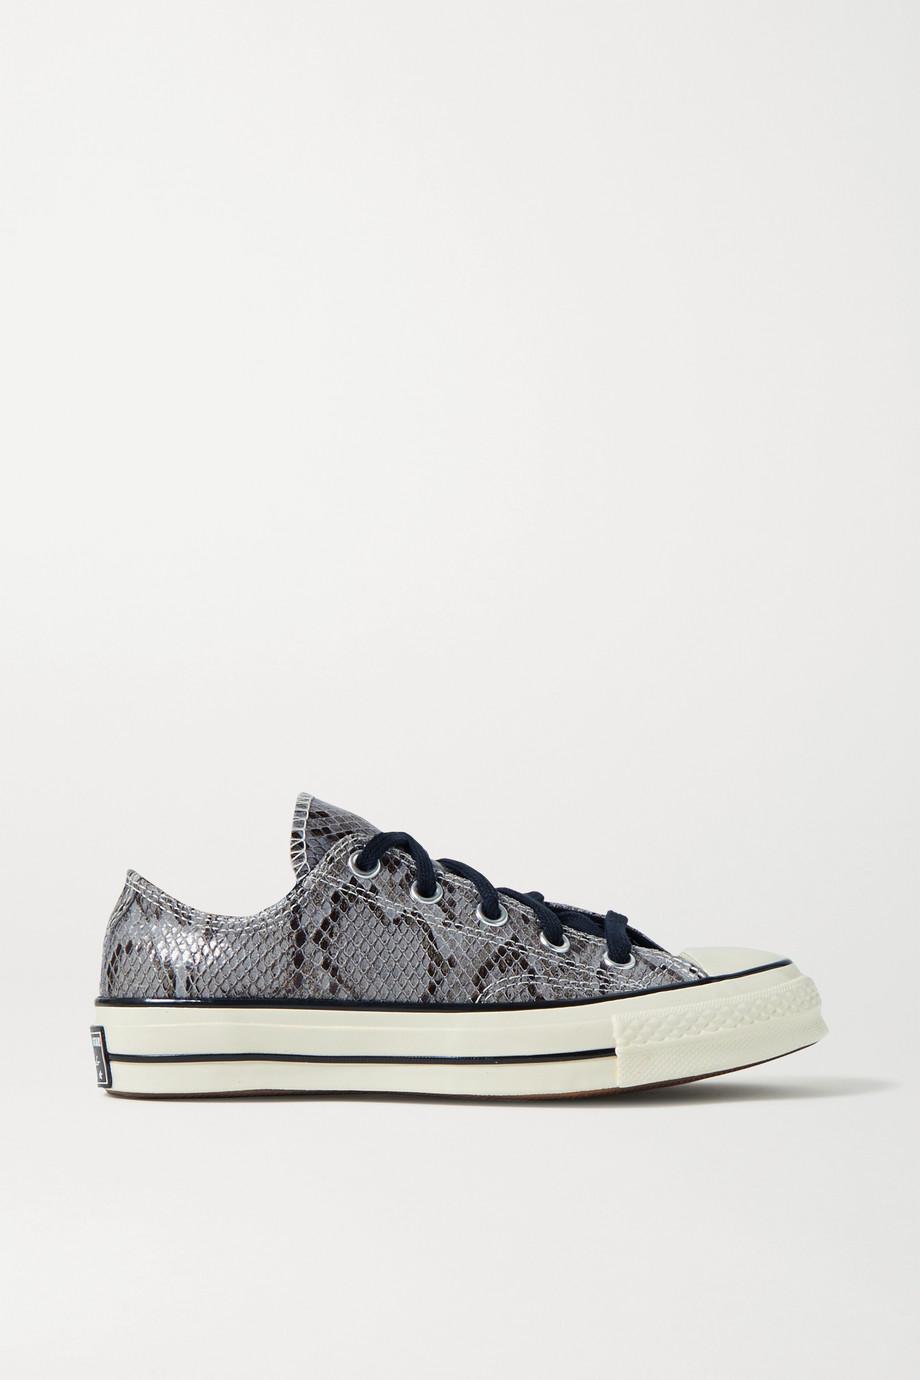 Converse Chuck Taylor All Star 70 Sneakers aus Leder mit Schlangeneffekt